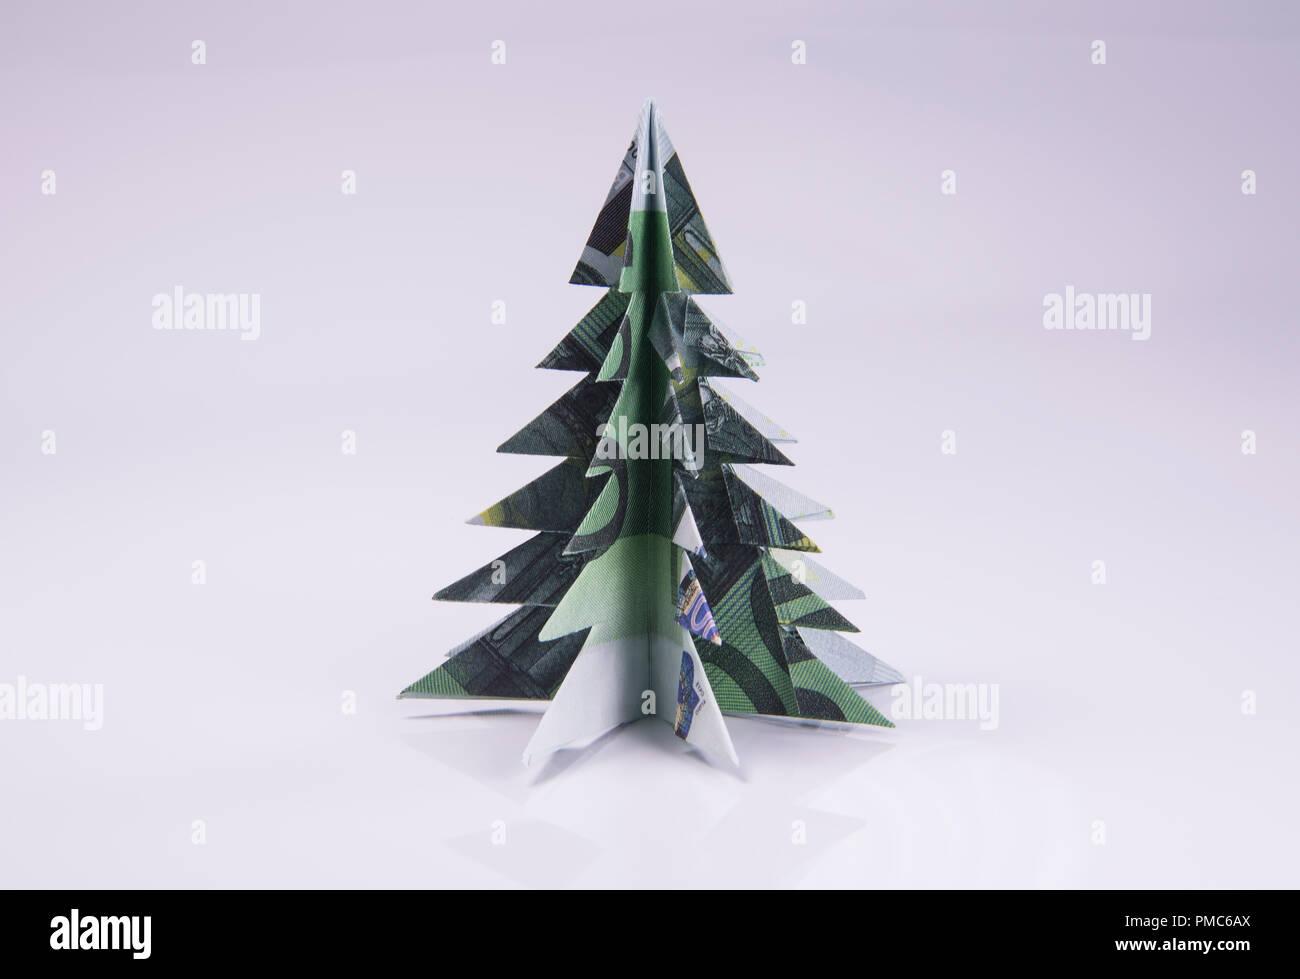 Money Origami Christmas tree Stock Photo - Alamy | 979x1300